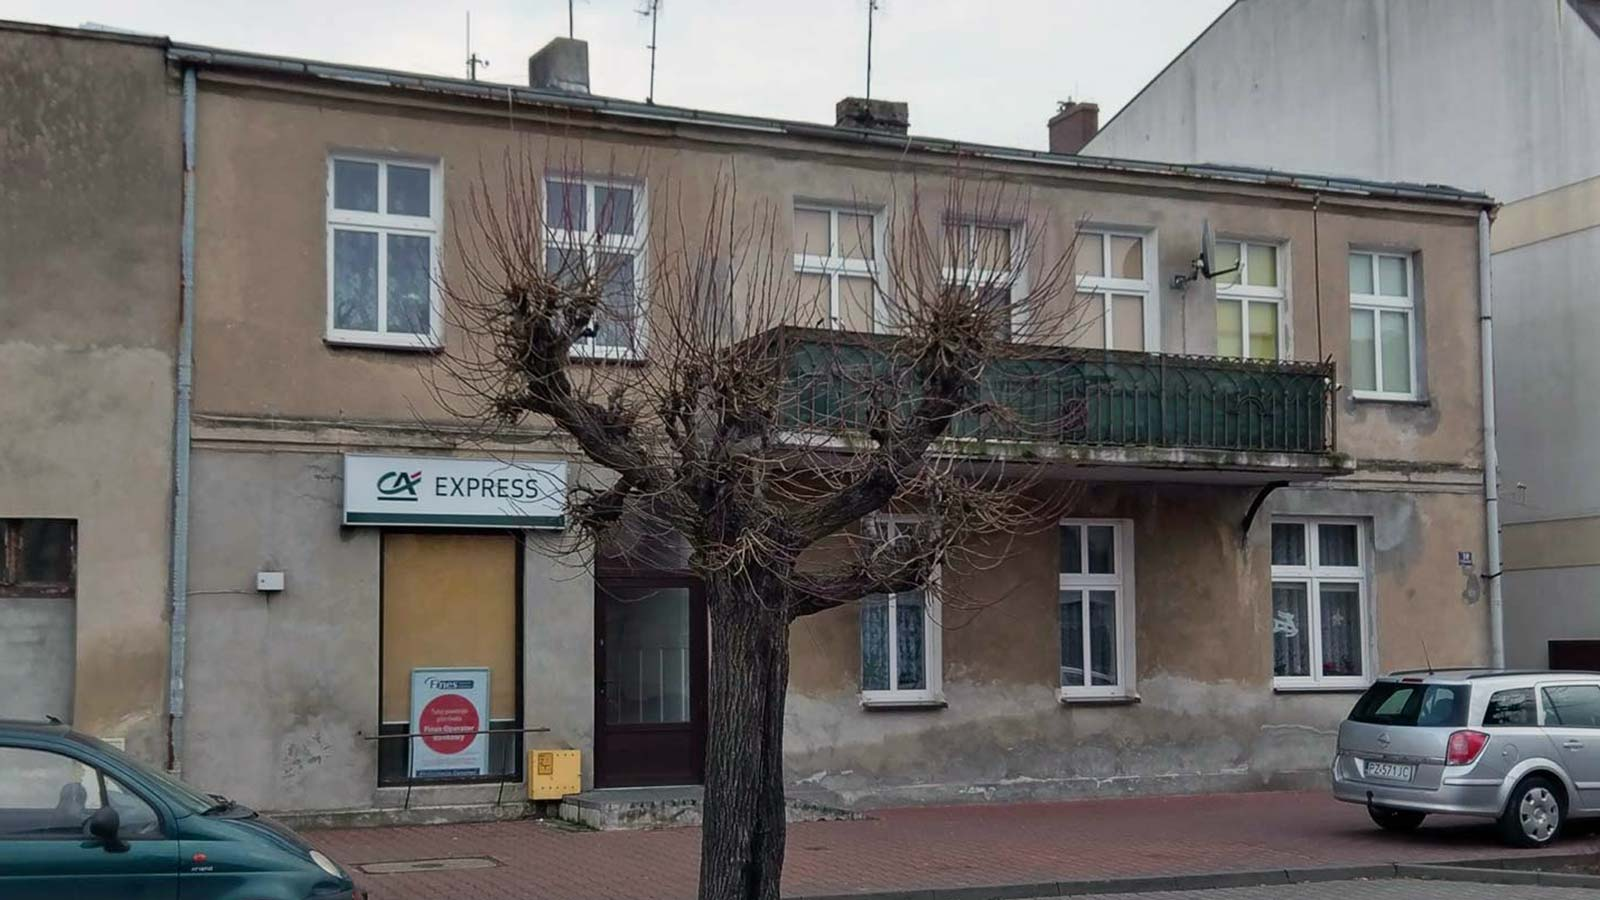 ul. Poznańska 10, Kórnik, 2018 rok